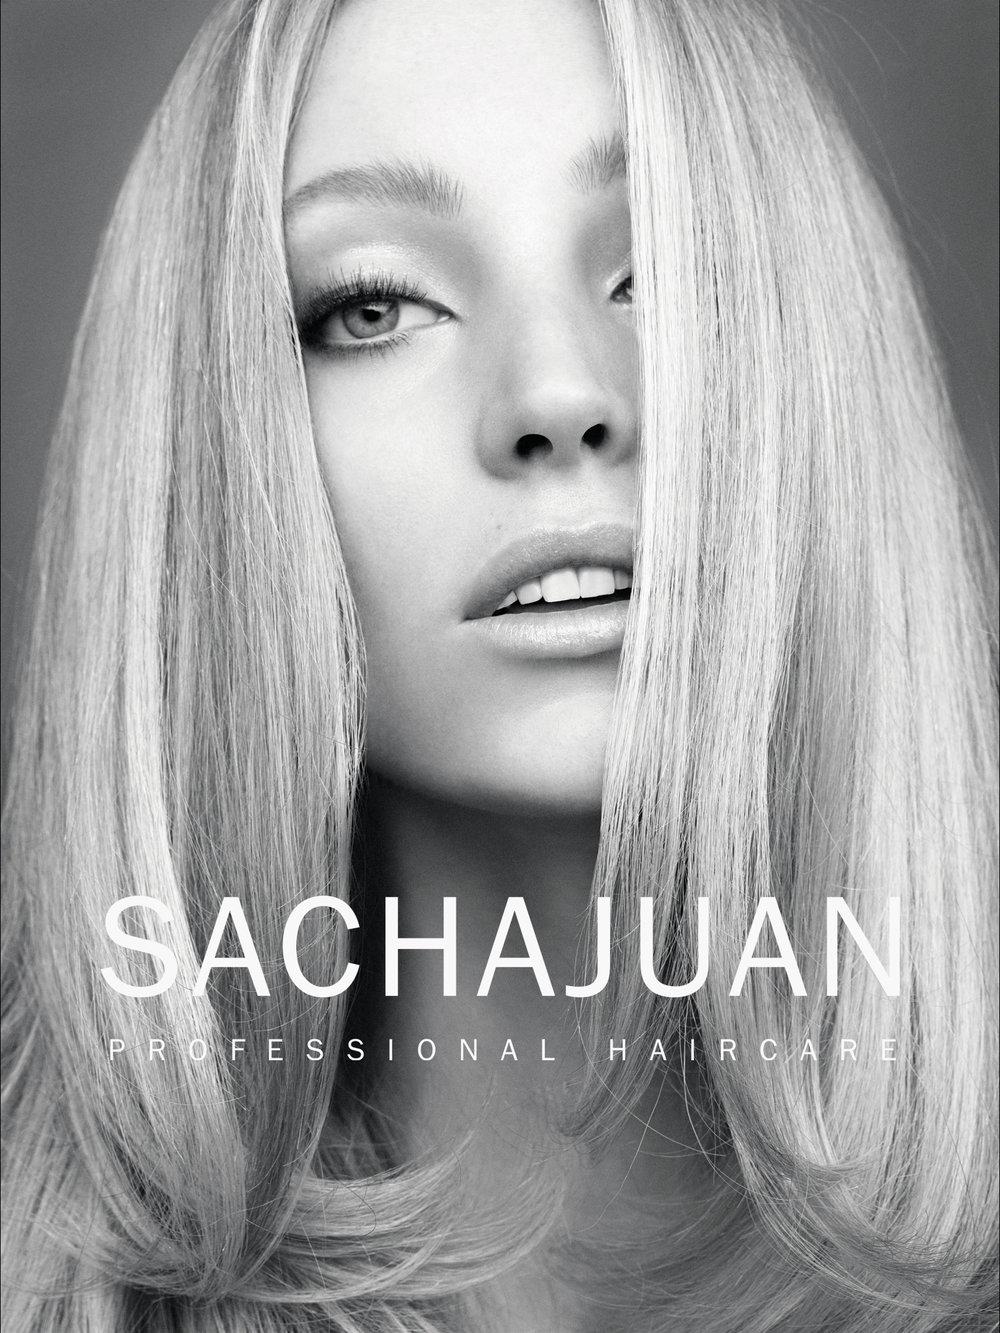 Sacha+Juan+hair+campaign+shot+in+Stockholm+by+Patrik+Andersson-2.jpeg